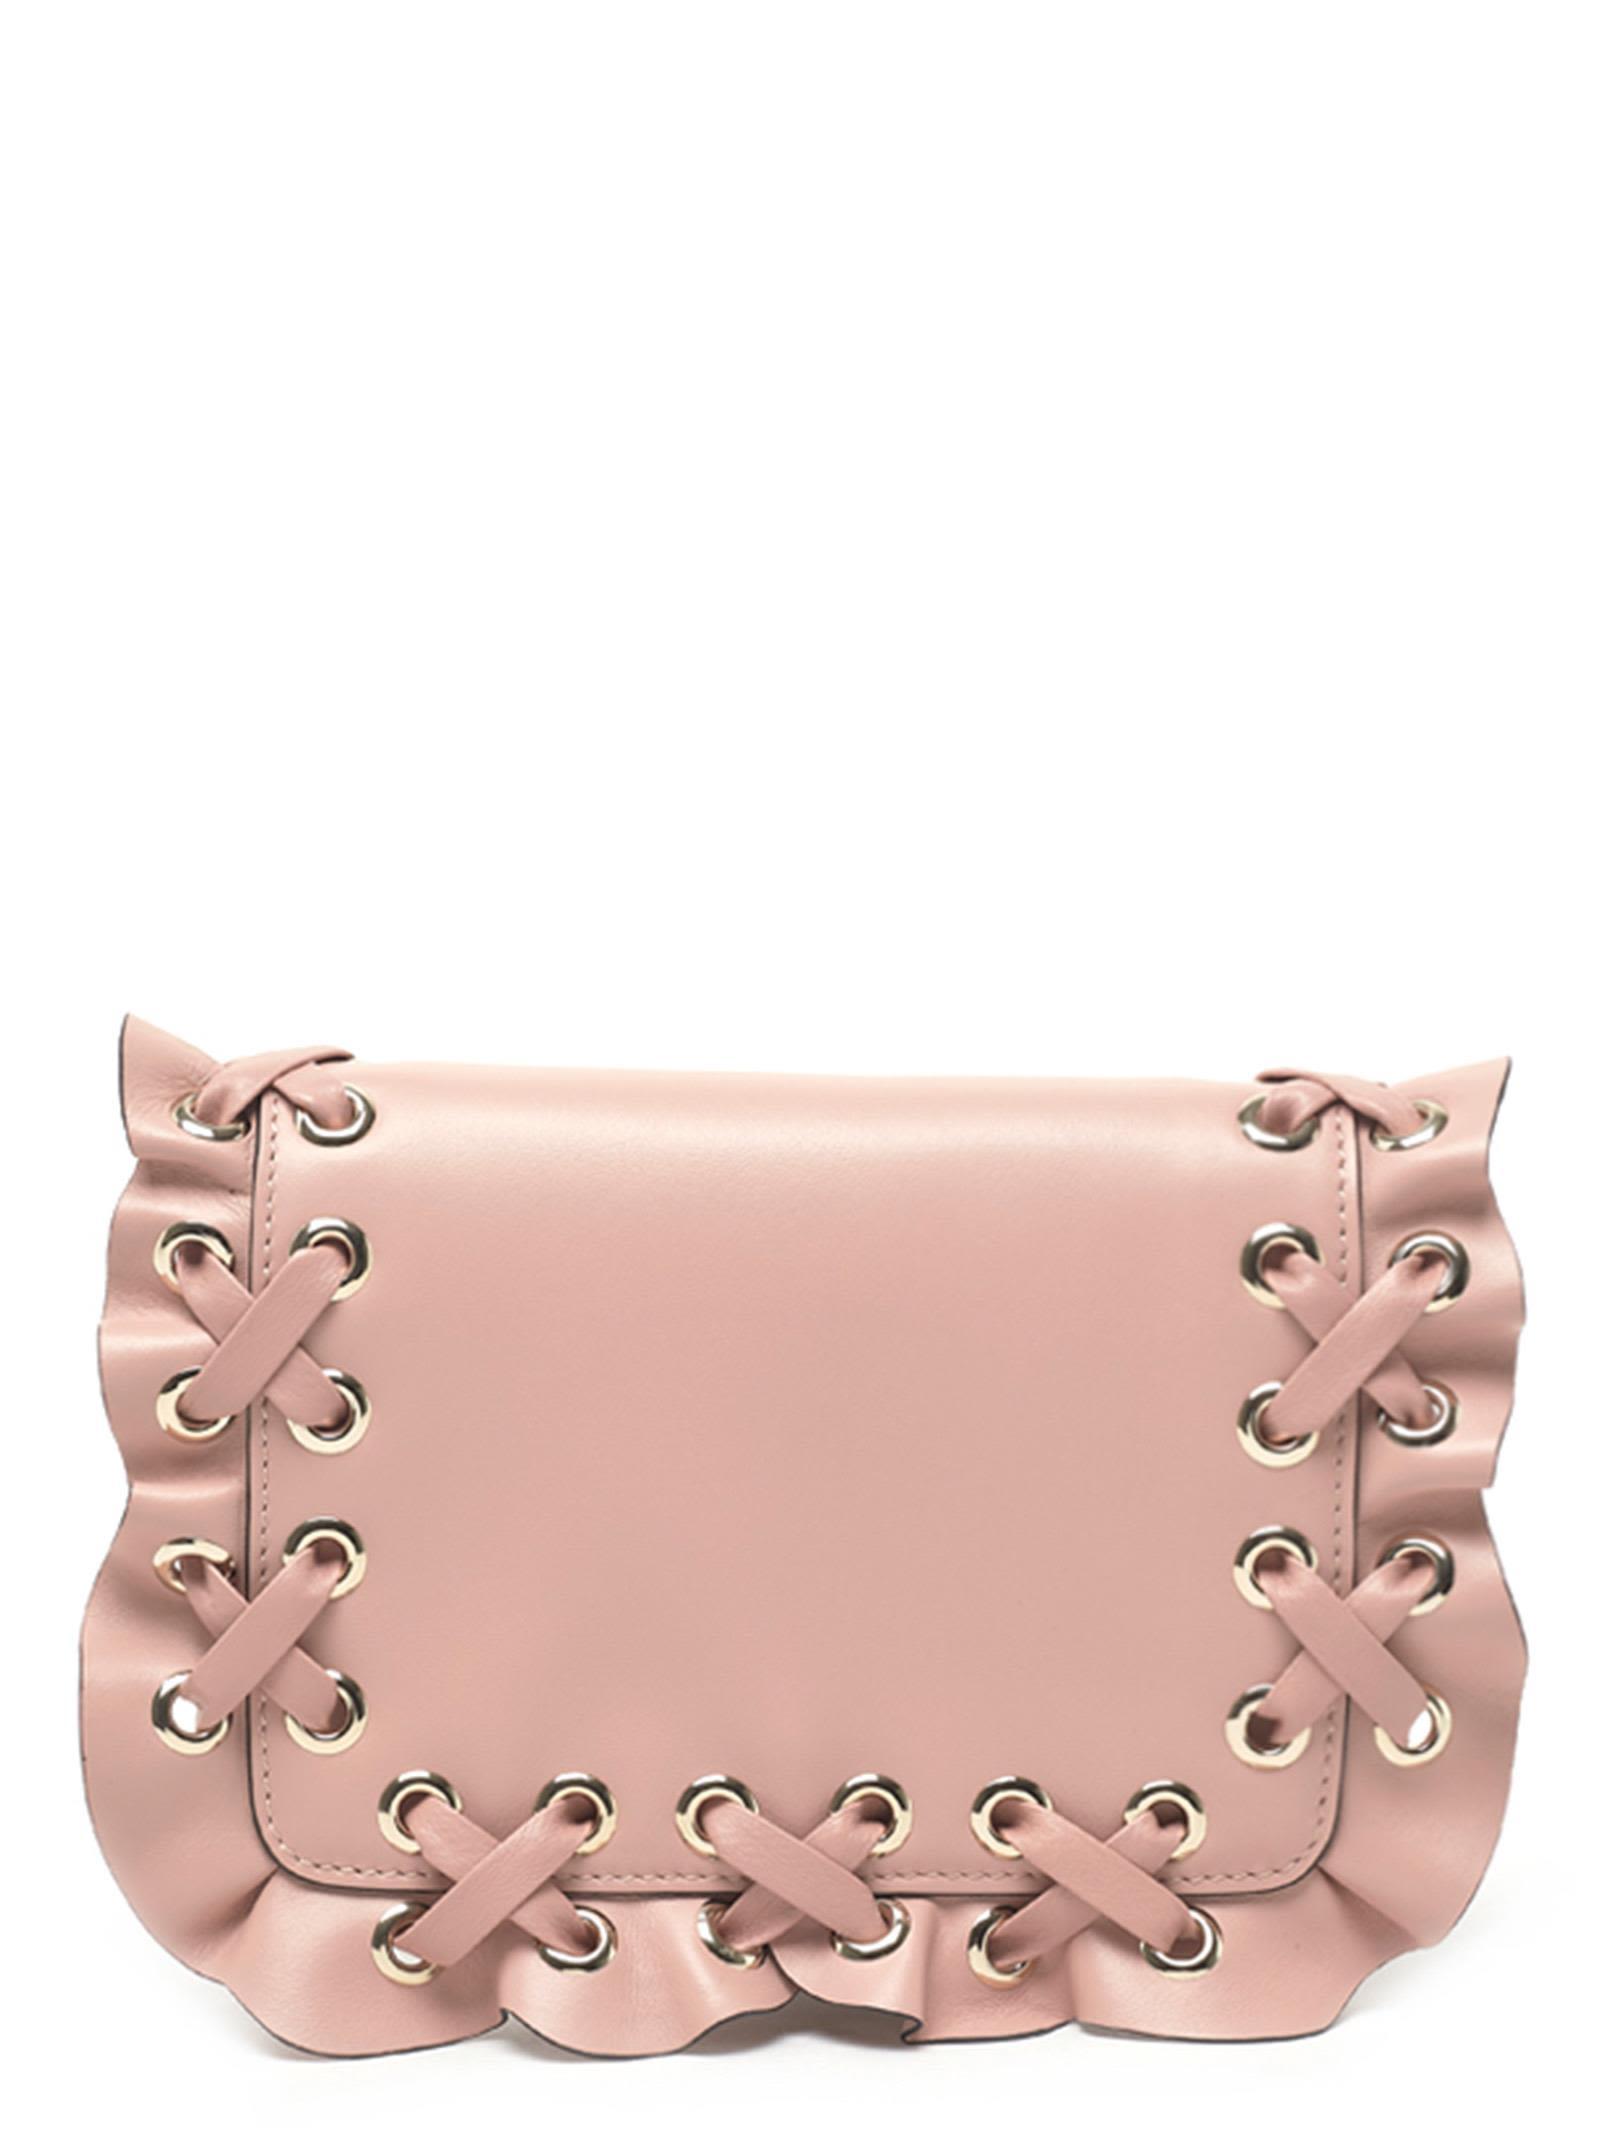 Red Valentino 'Rock Ruffle' Bag, Pink